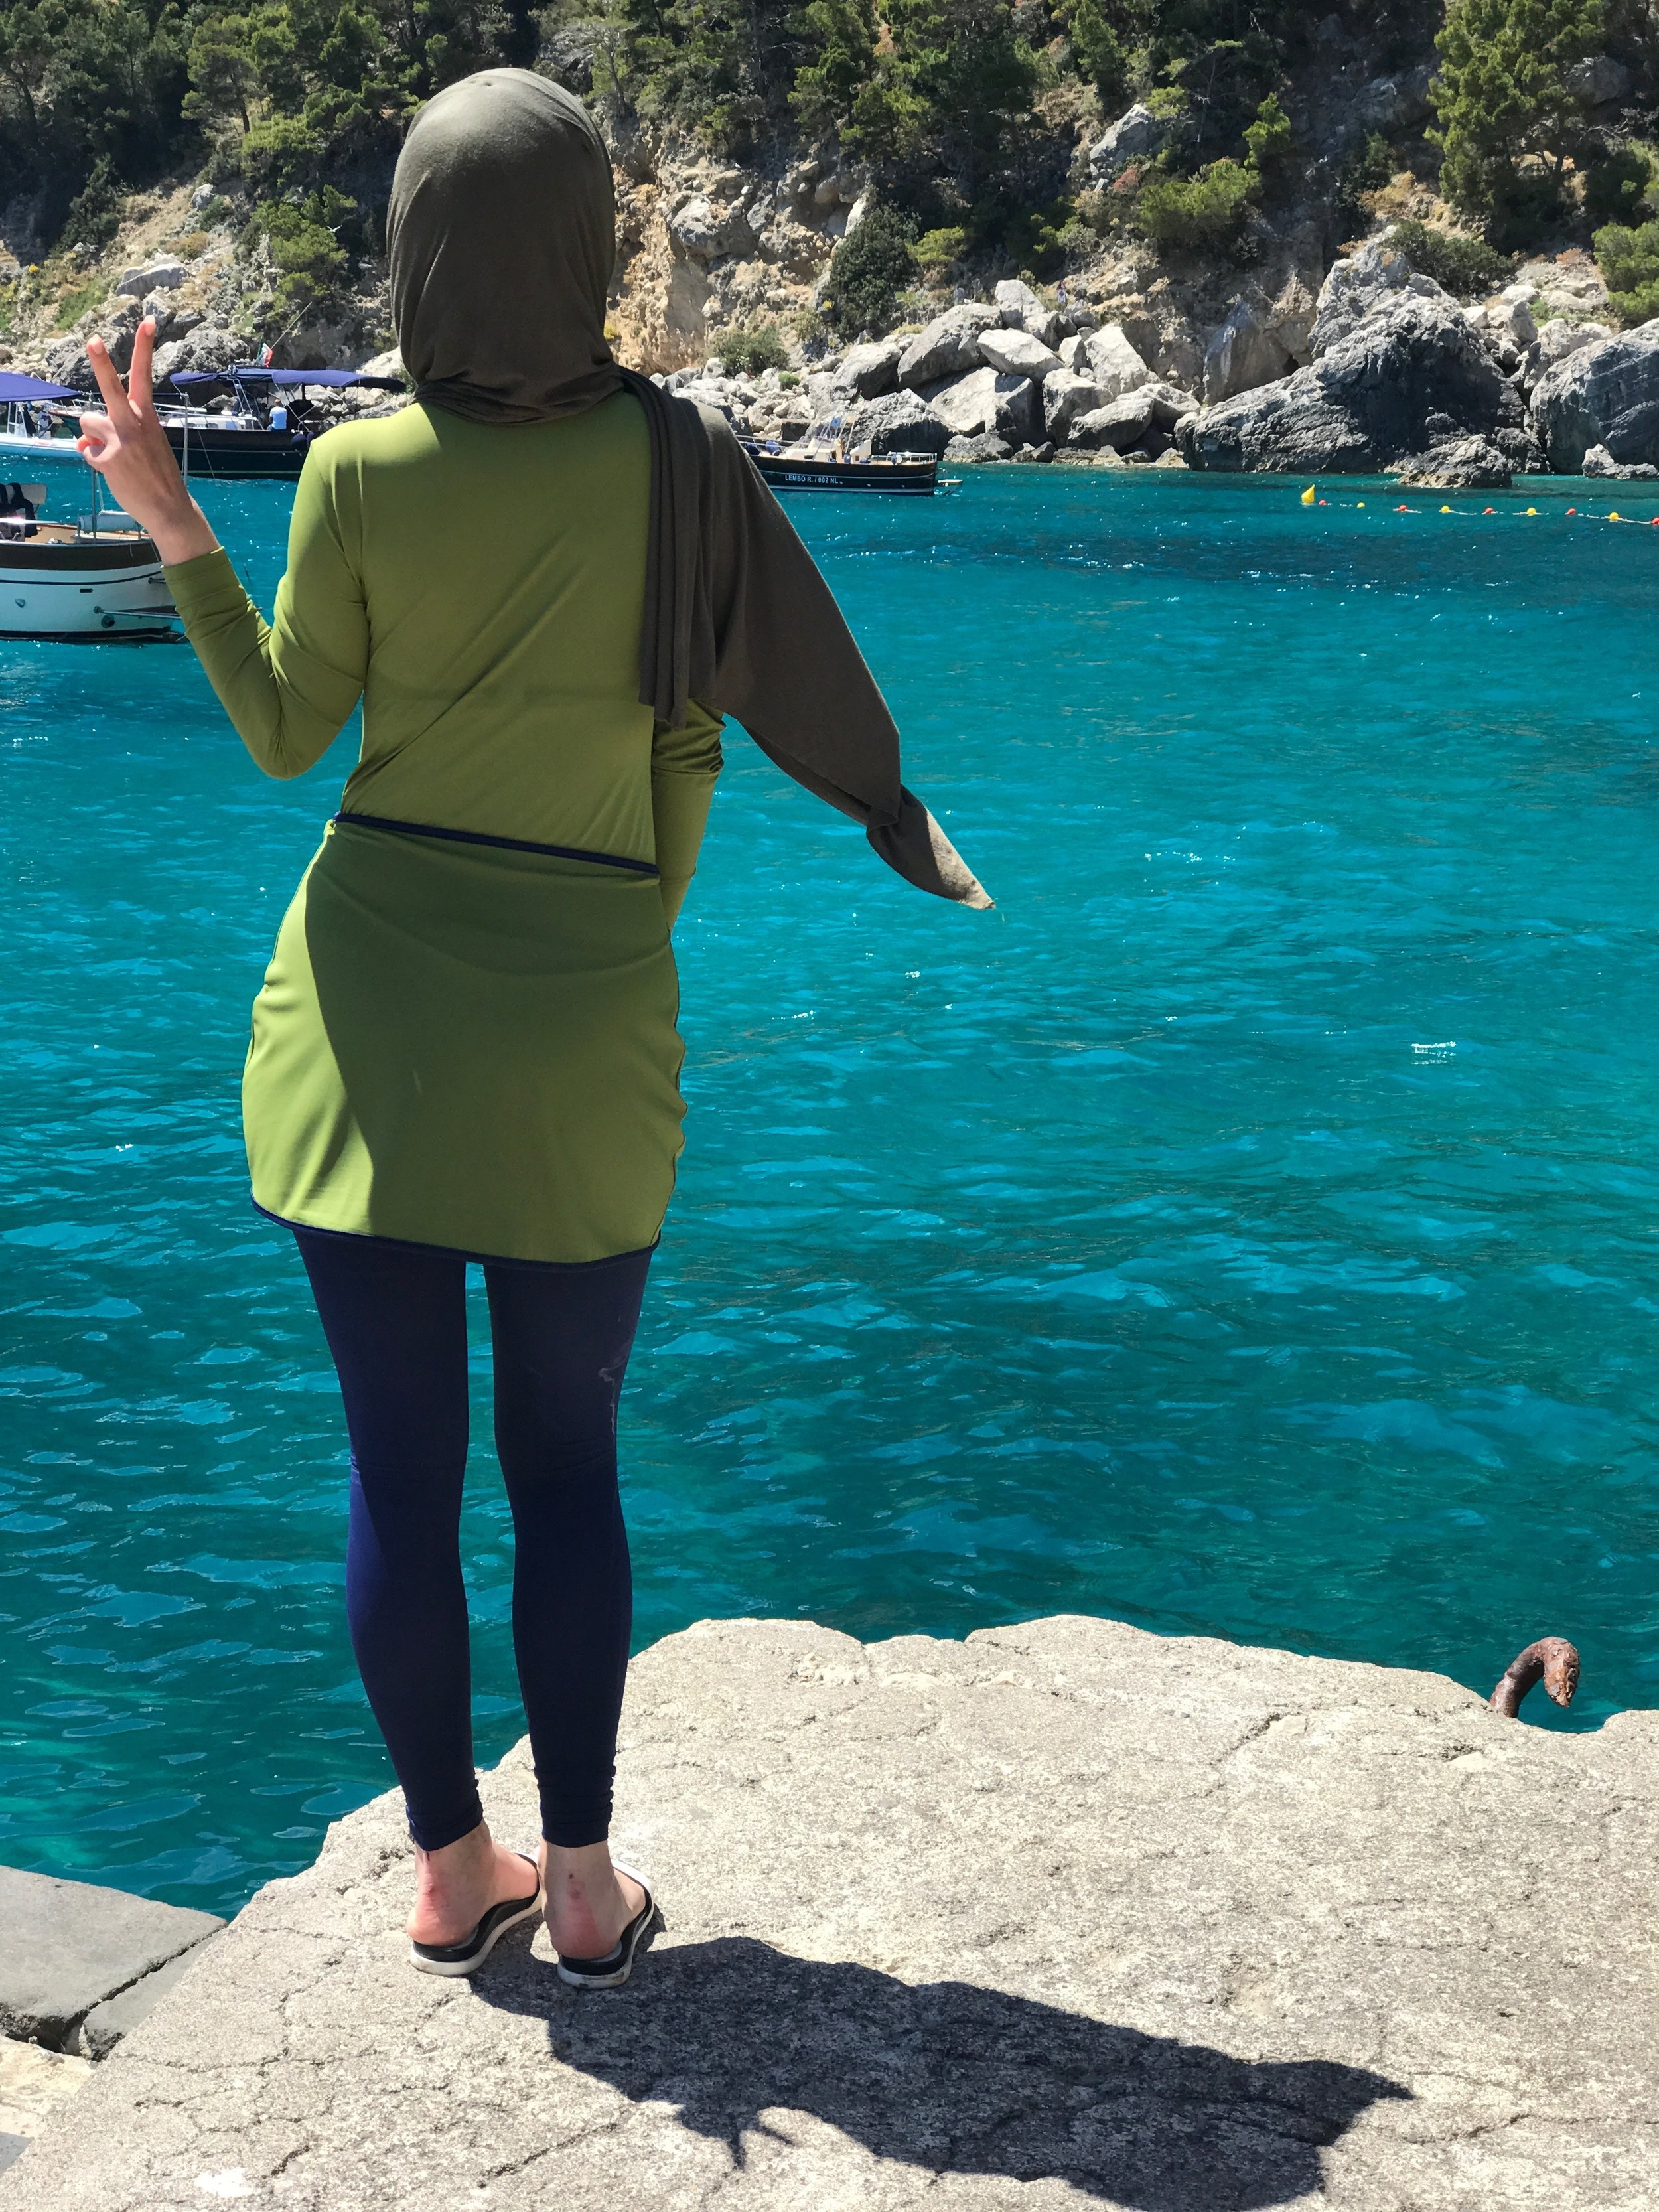 Lyra Swim_2.jpeg